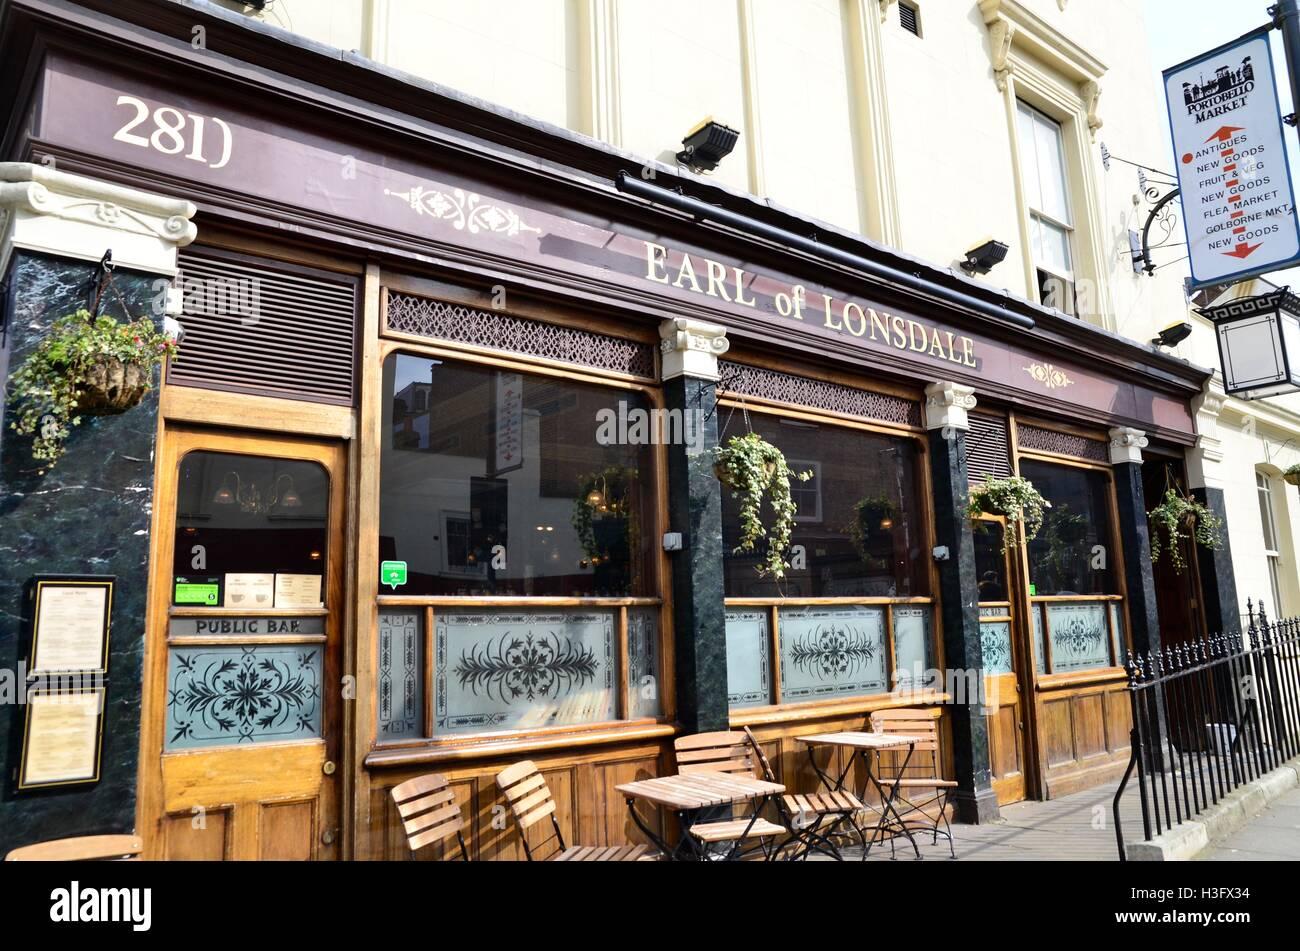 Earl of Lonsdale Pub, Portobello Road, Notting Hill, London, England, UK - Stock Image